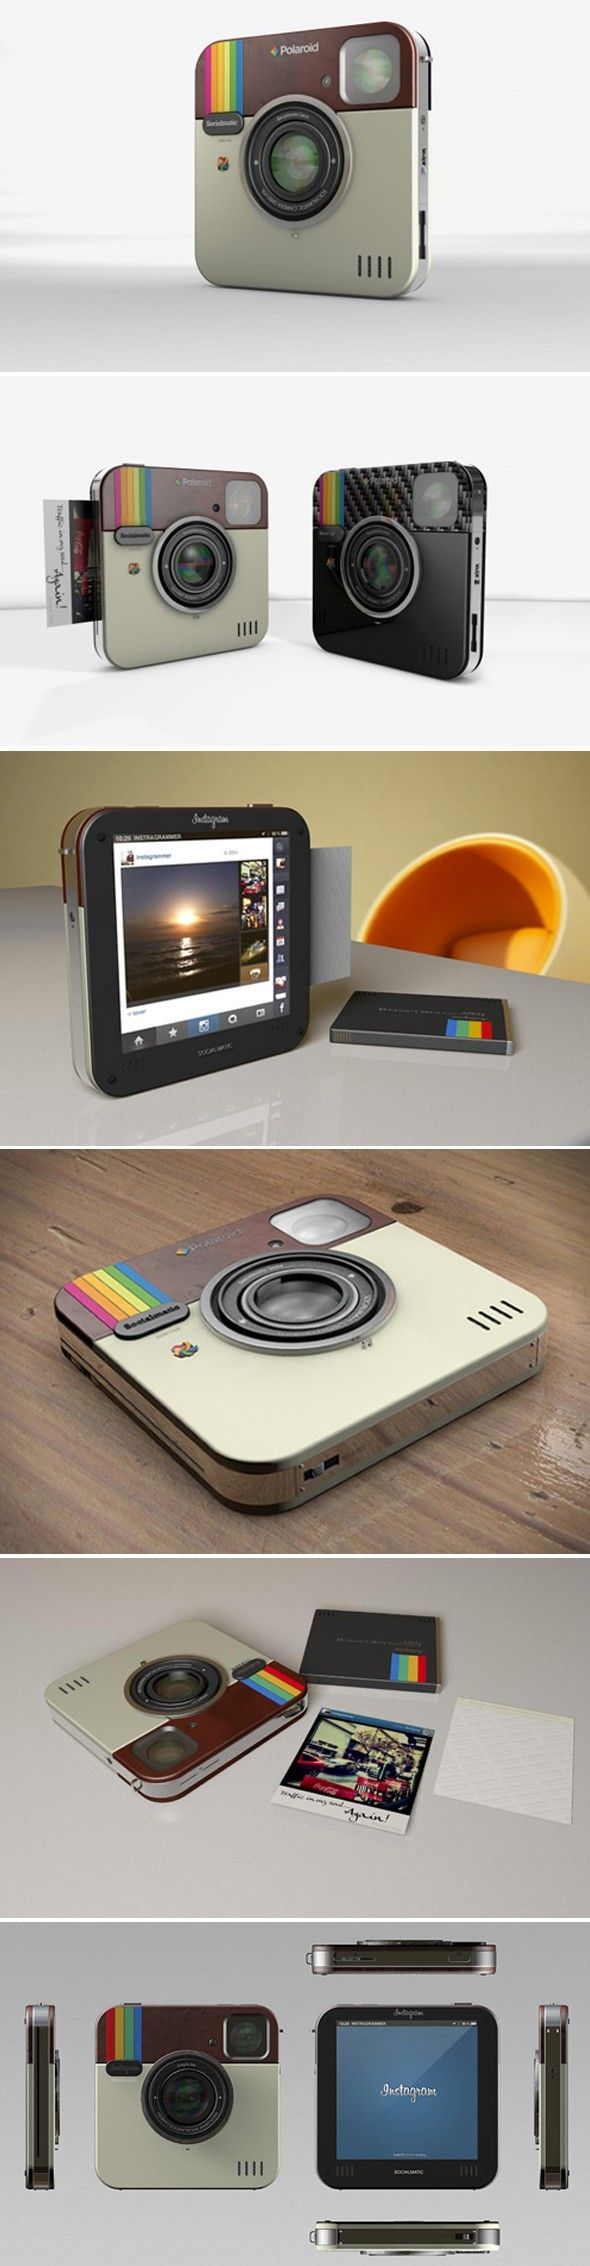 Appareil Polaroid instagram et imprimante - Journal du Design